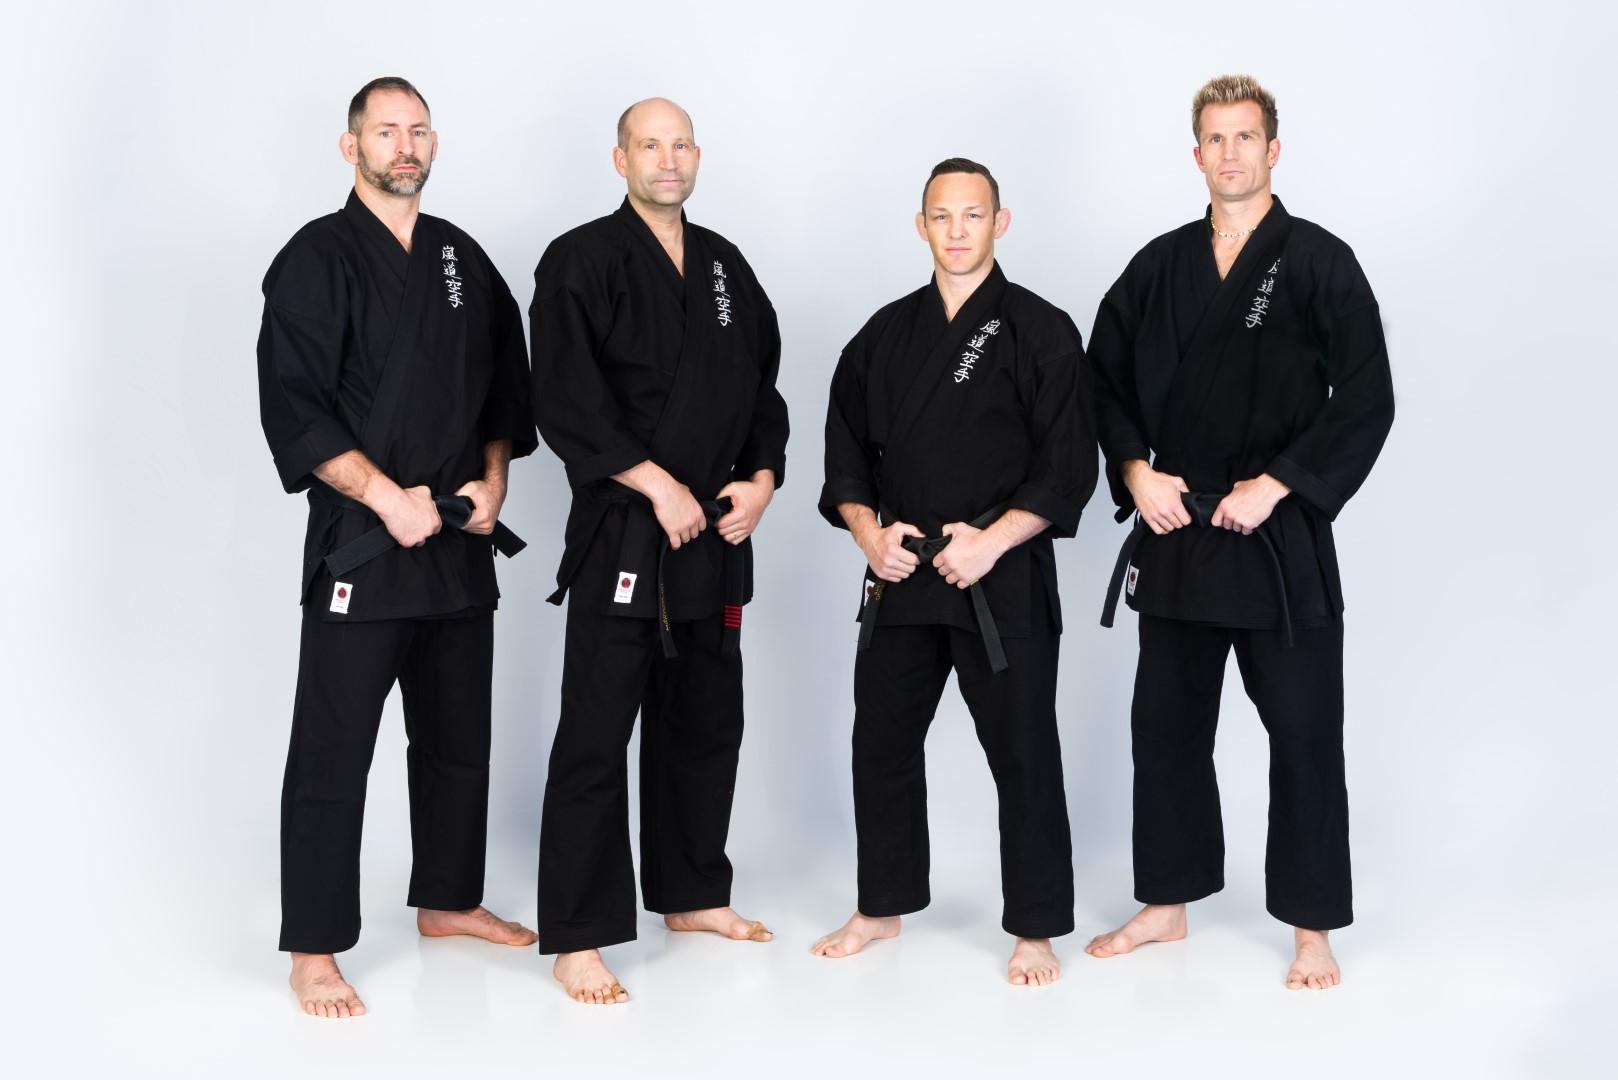 4 Head Instructors Posing in Black Uniforms